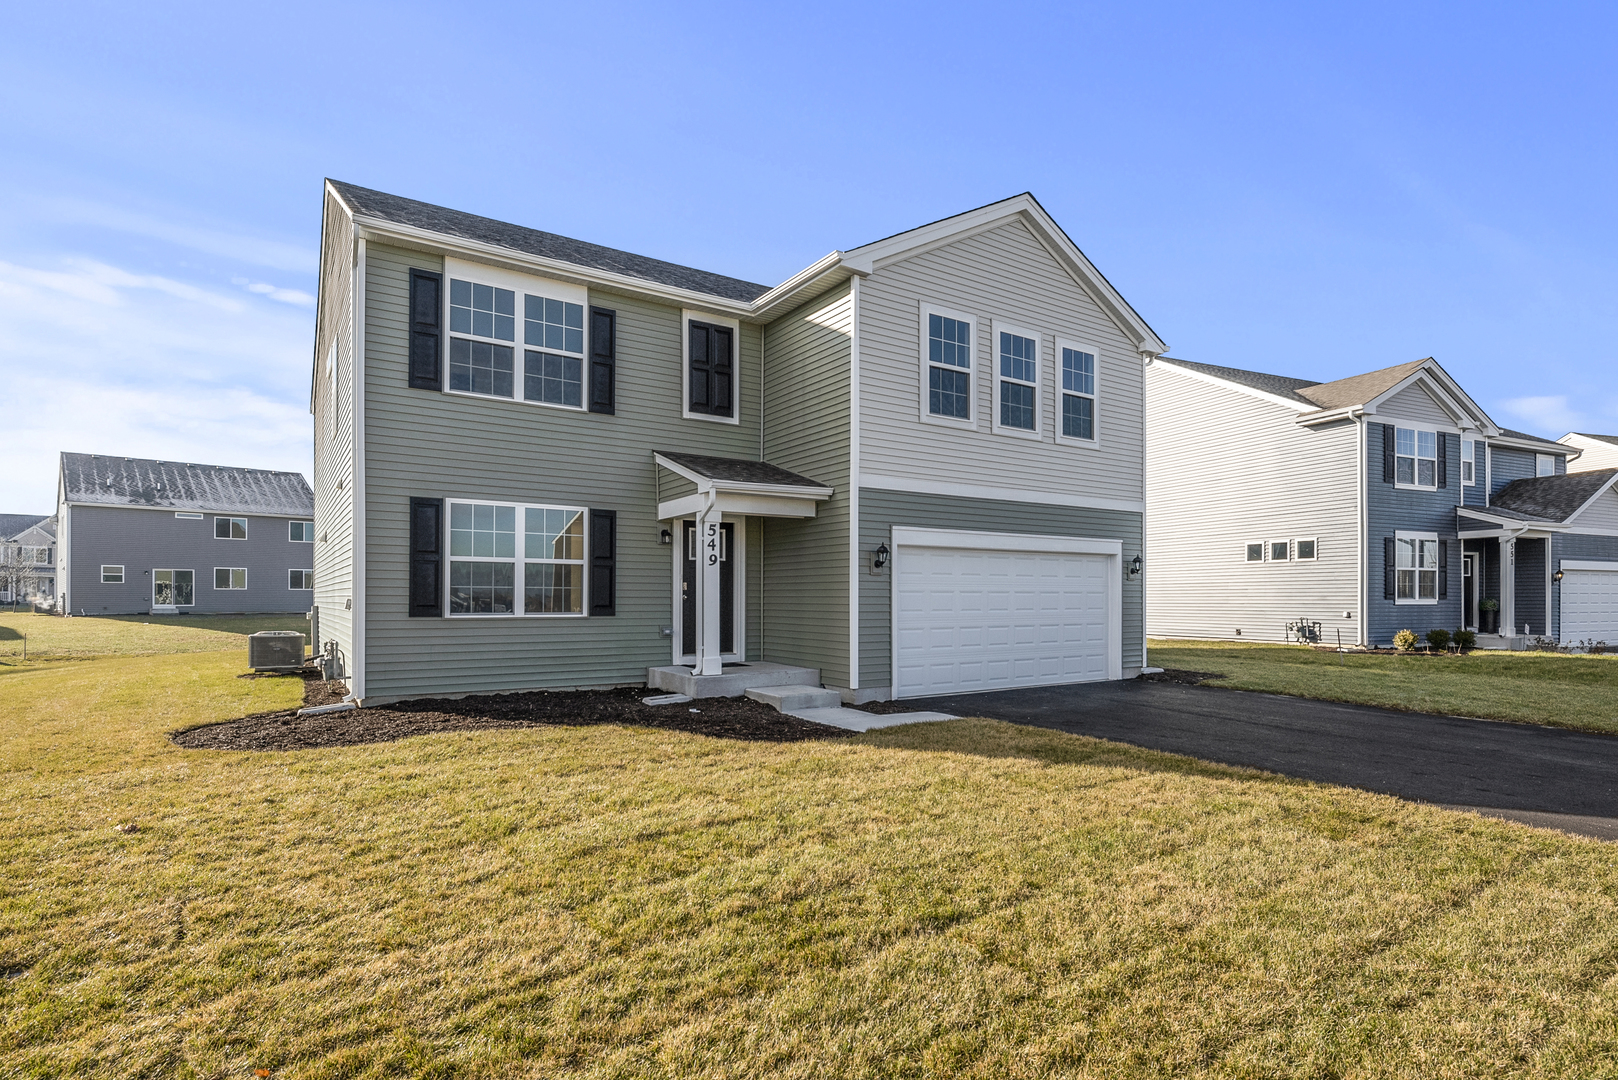 549 Colchester, Oswego, Illinois, 60543